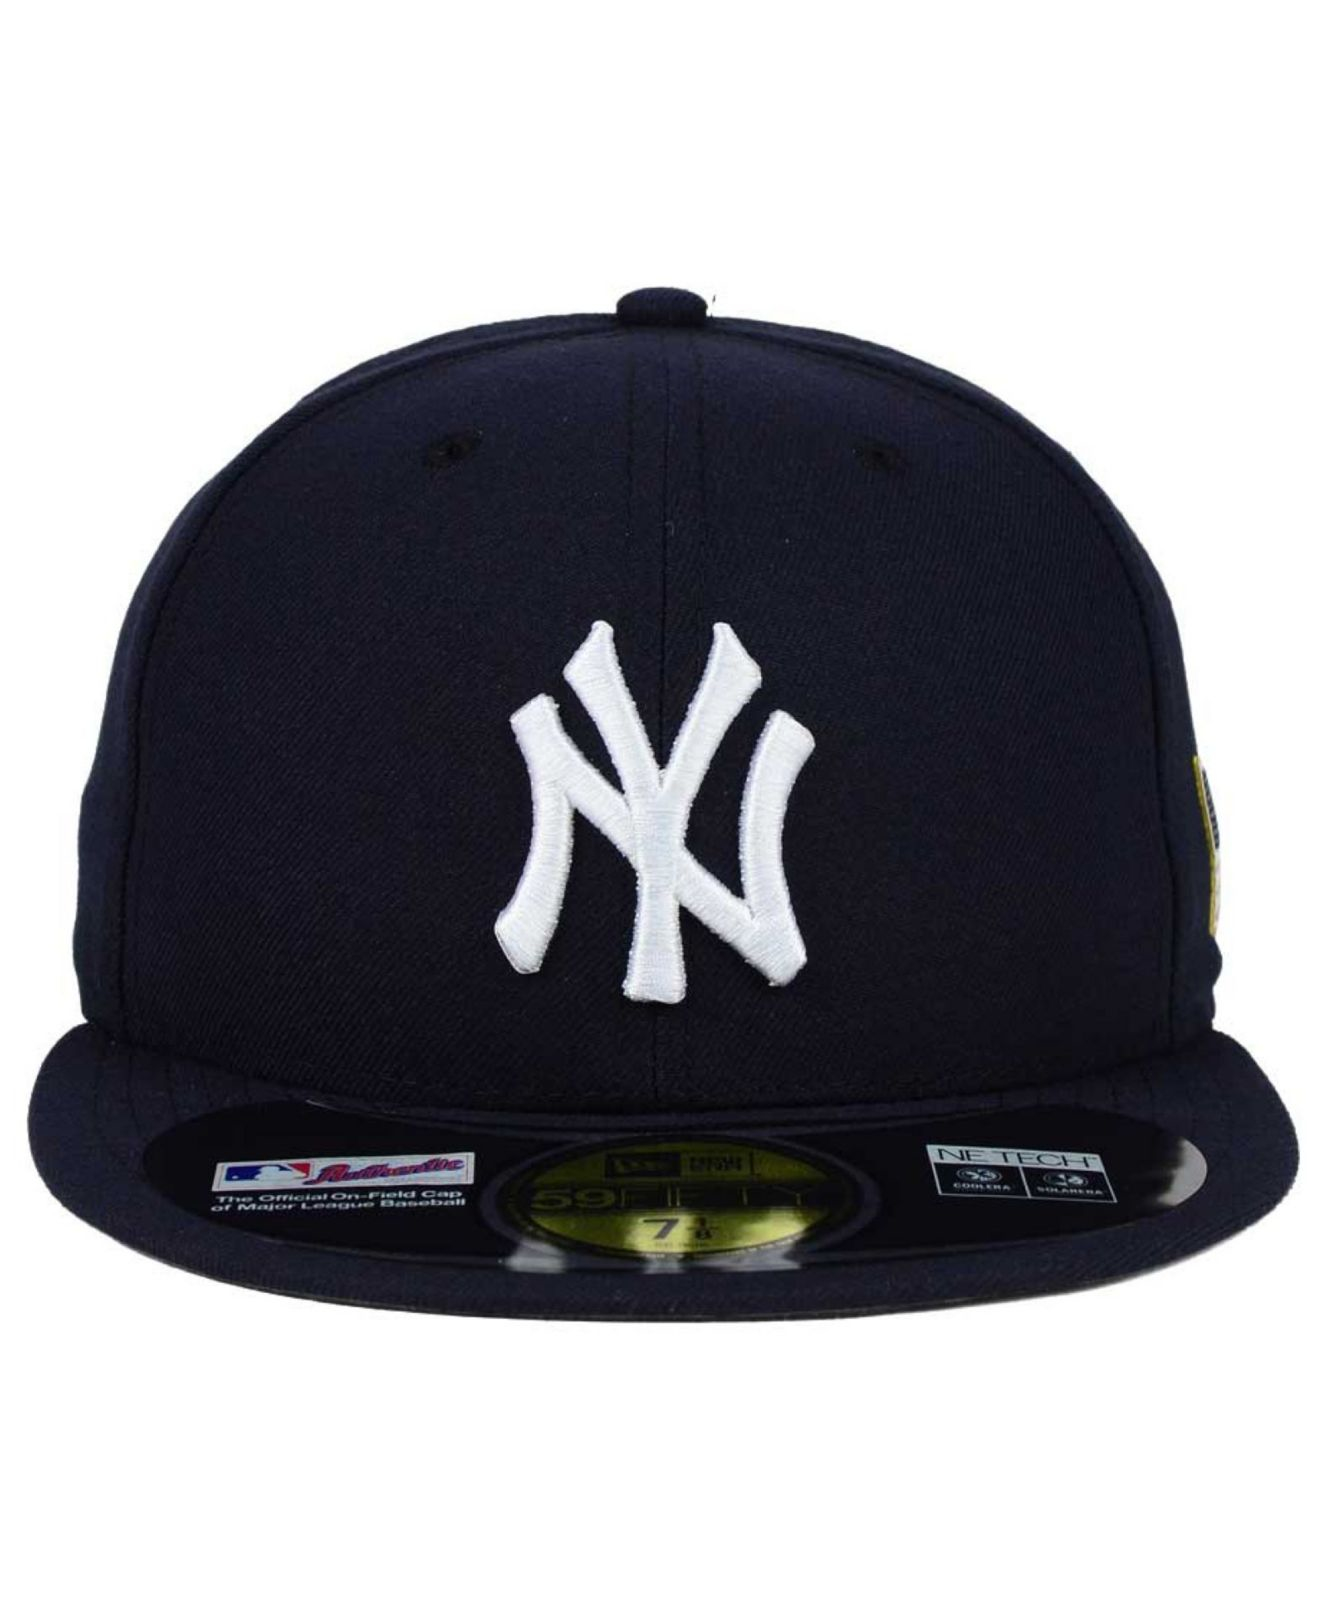 b78da6caf68 ... lyst ktz new york yankees ac 9 11 patch 59fifty cap in blue for men